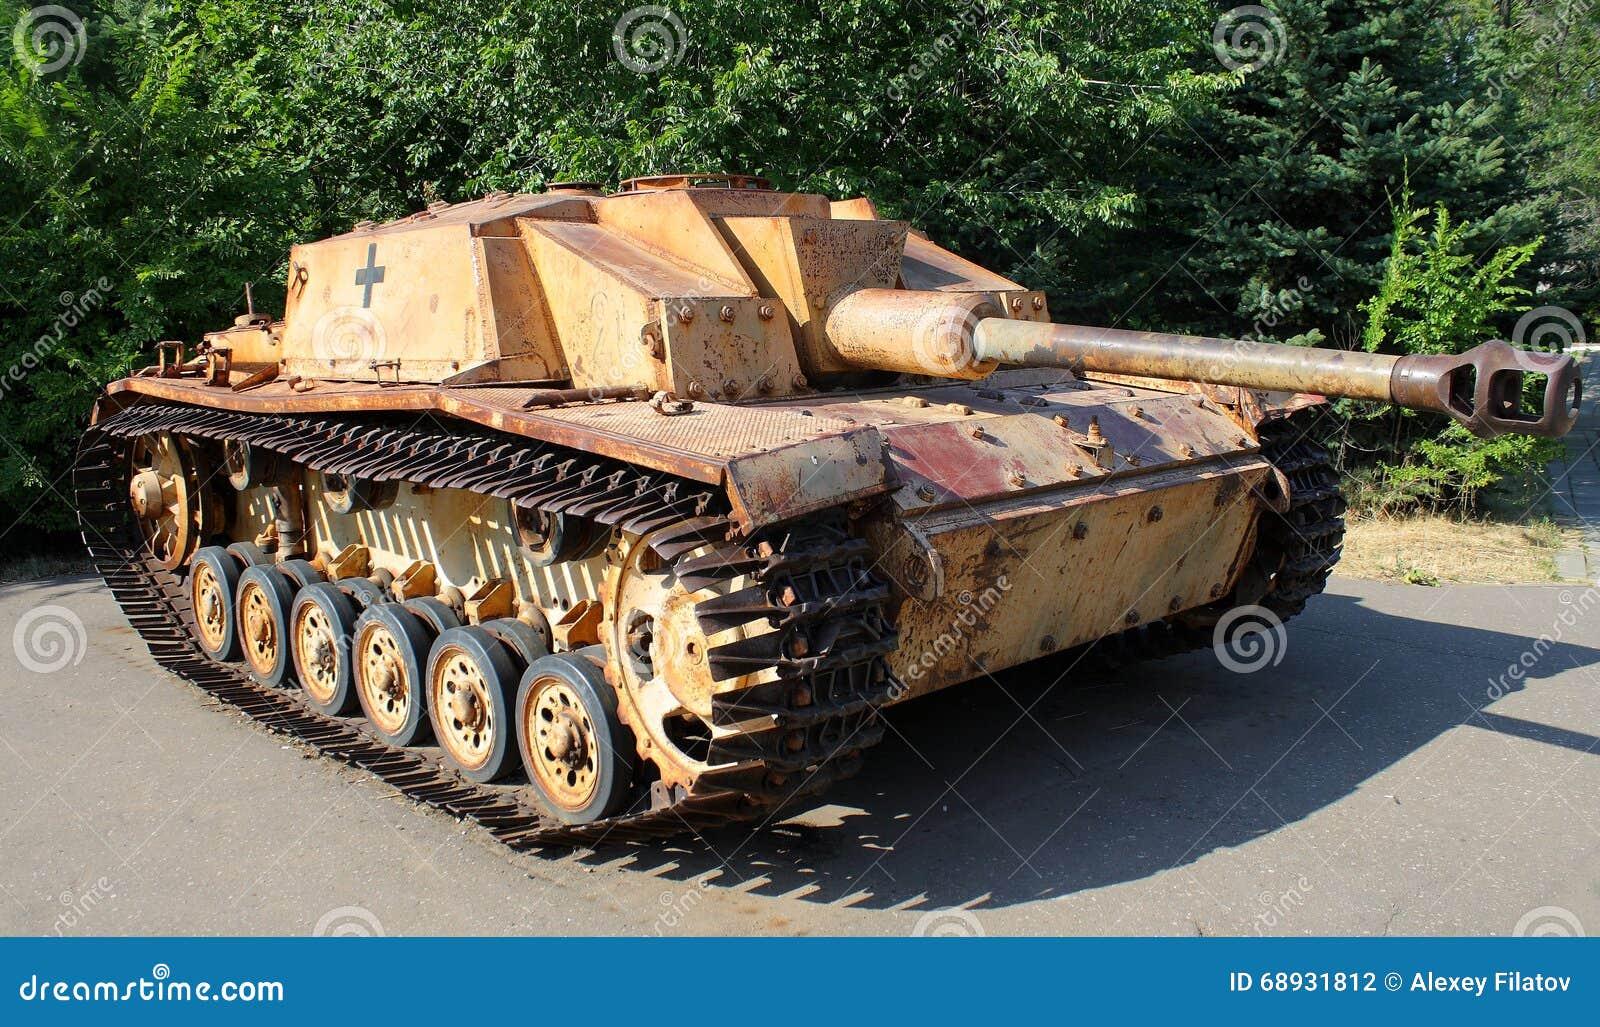 Немецкий фашизм армии оружия танка